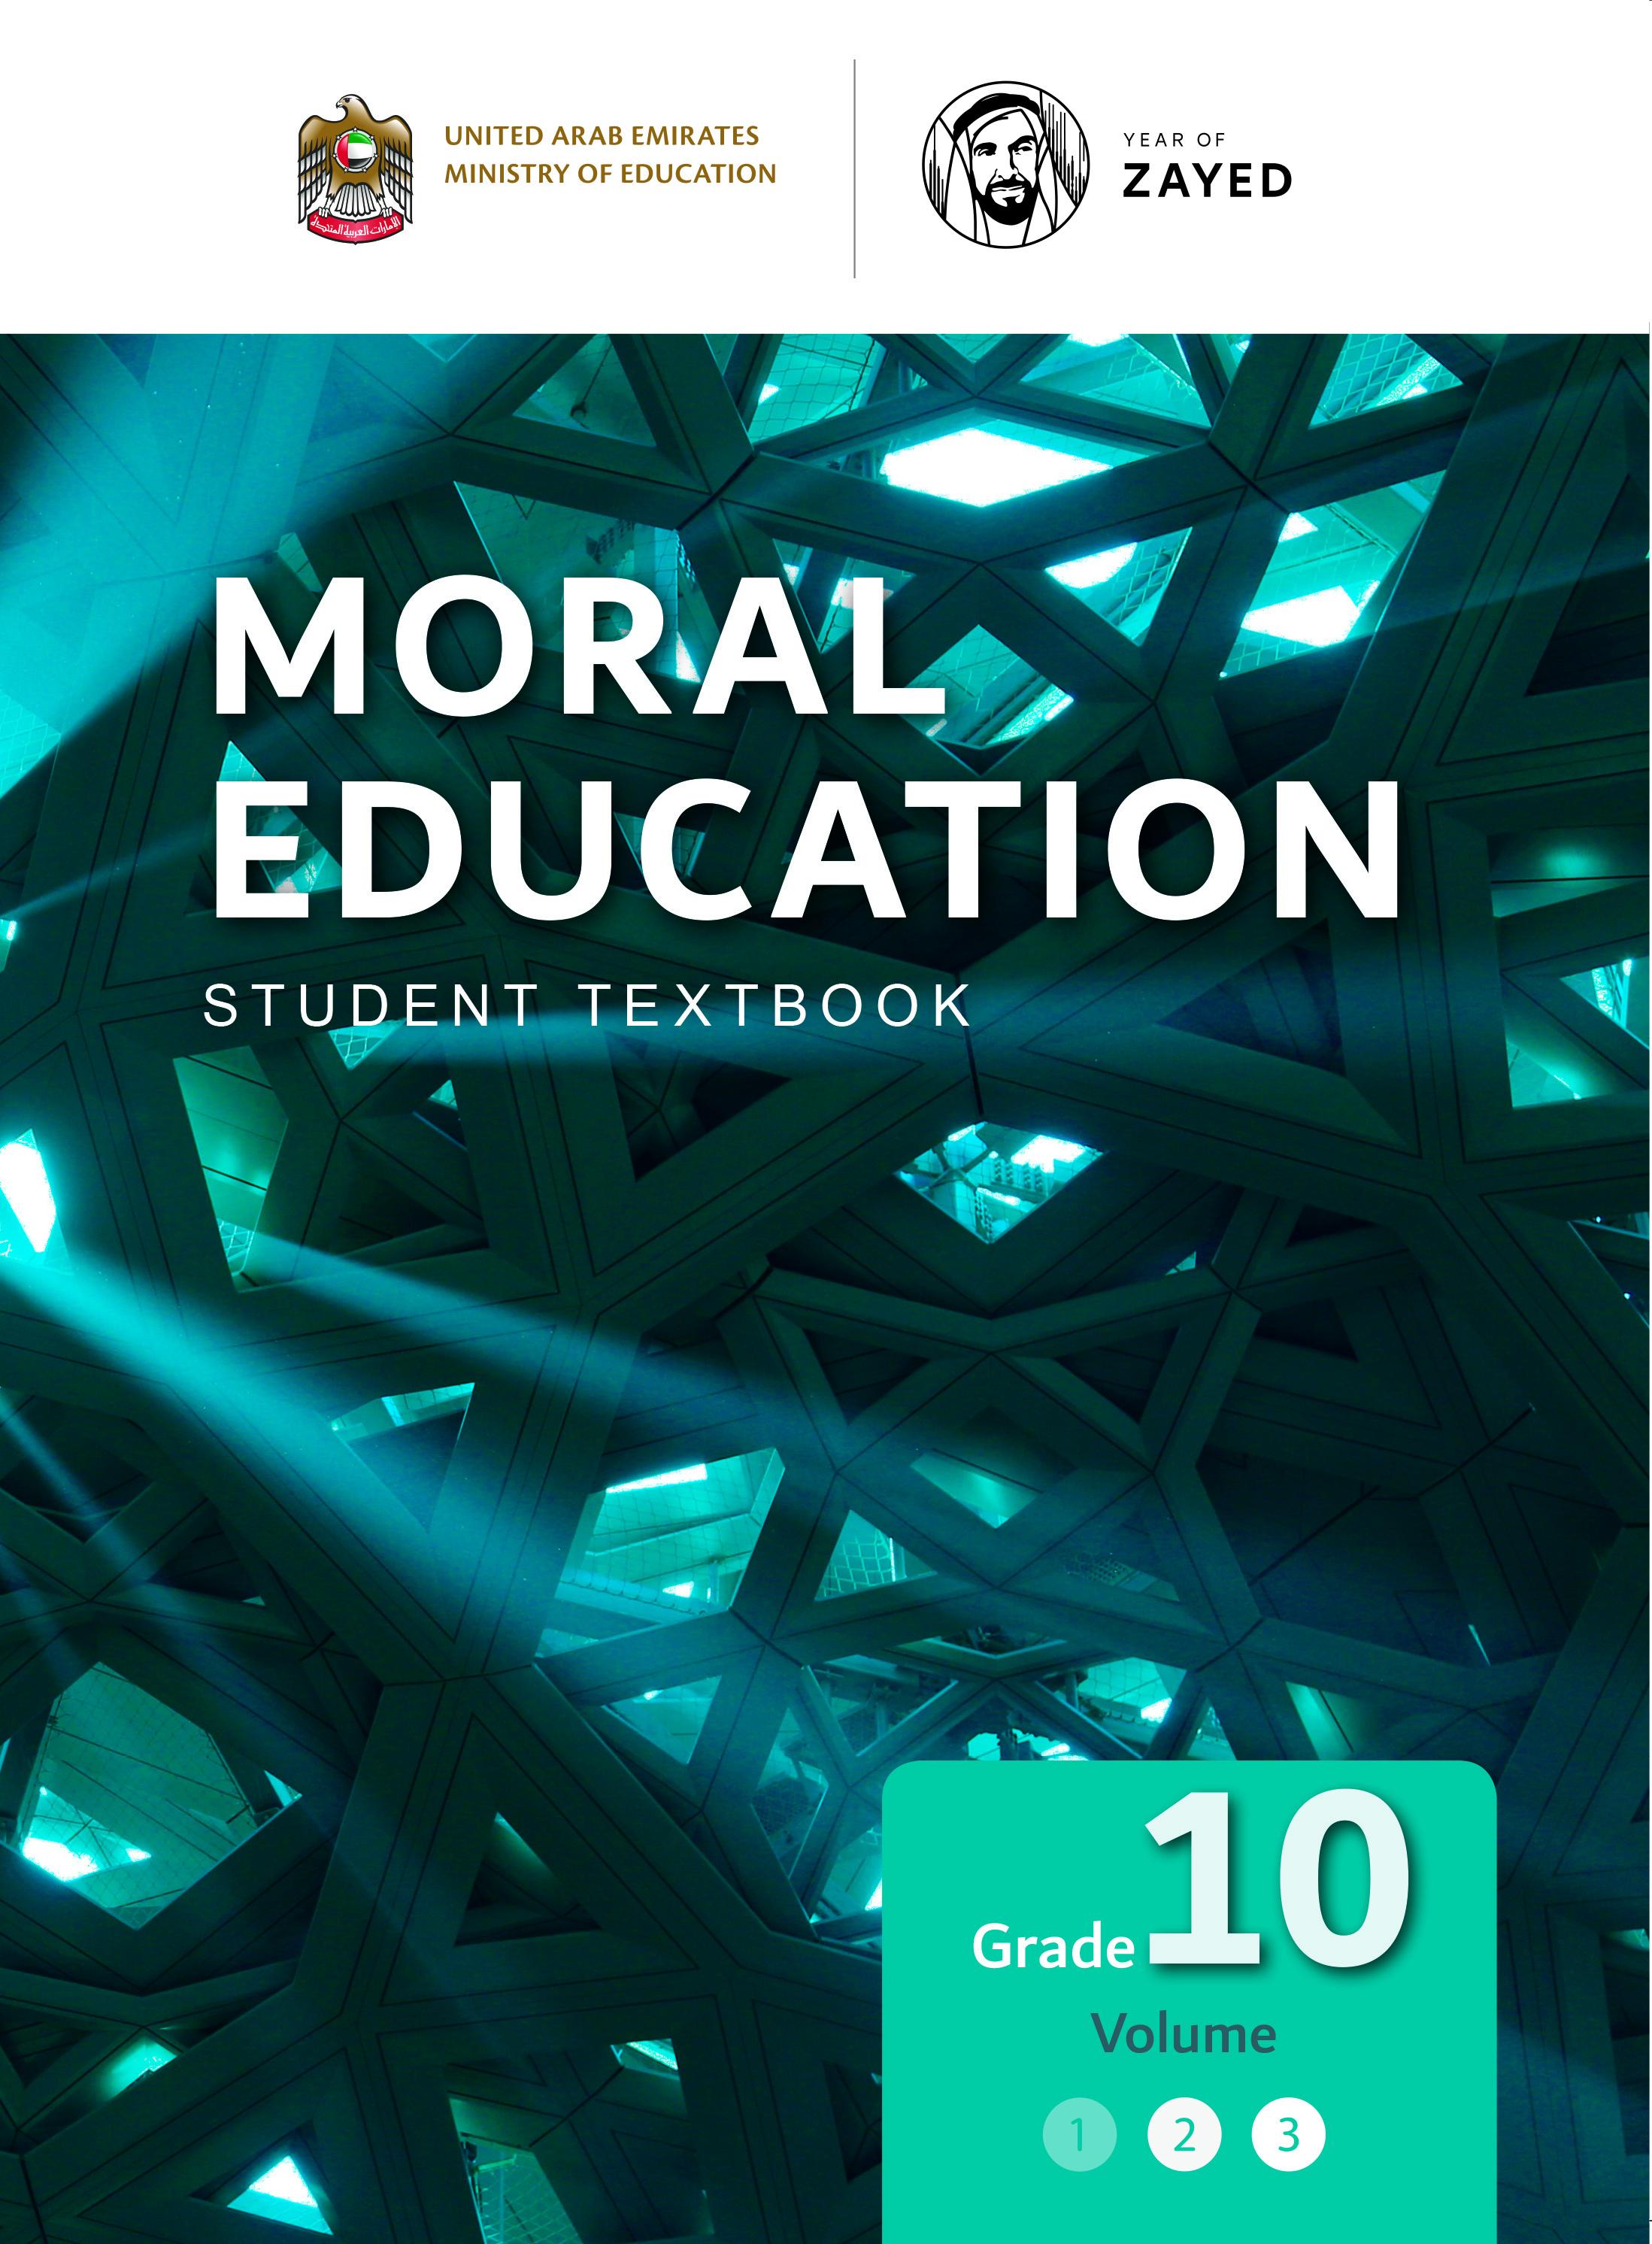 Moral Education - SE - G10 - P01